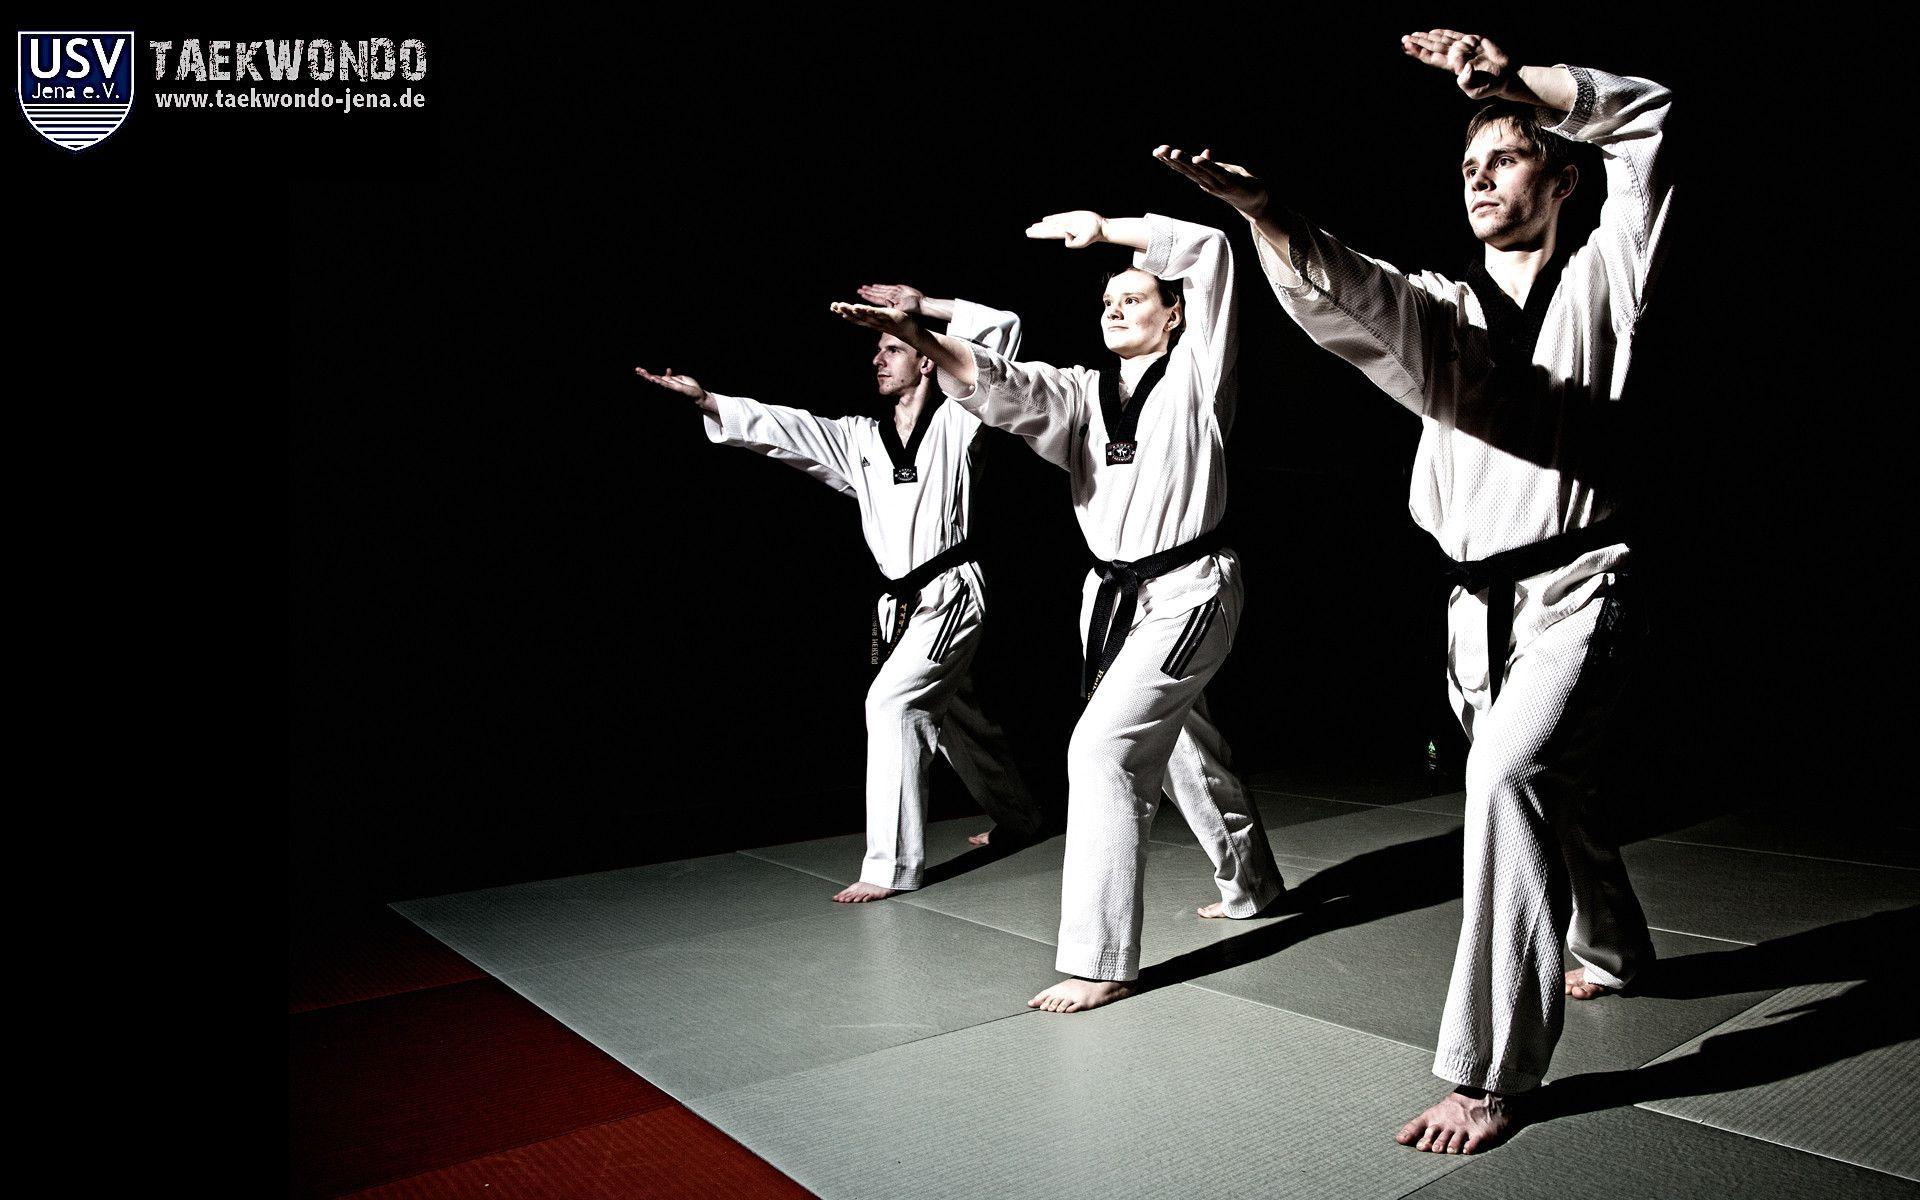 Taekwondo Quotes Taekwondo Wallpaper  Google Search  Martial Arts  Pinterest